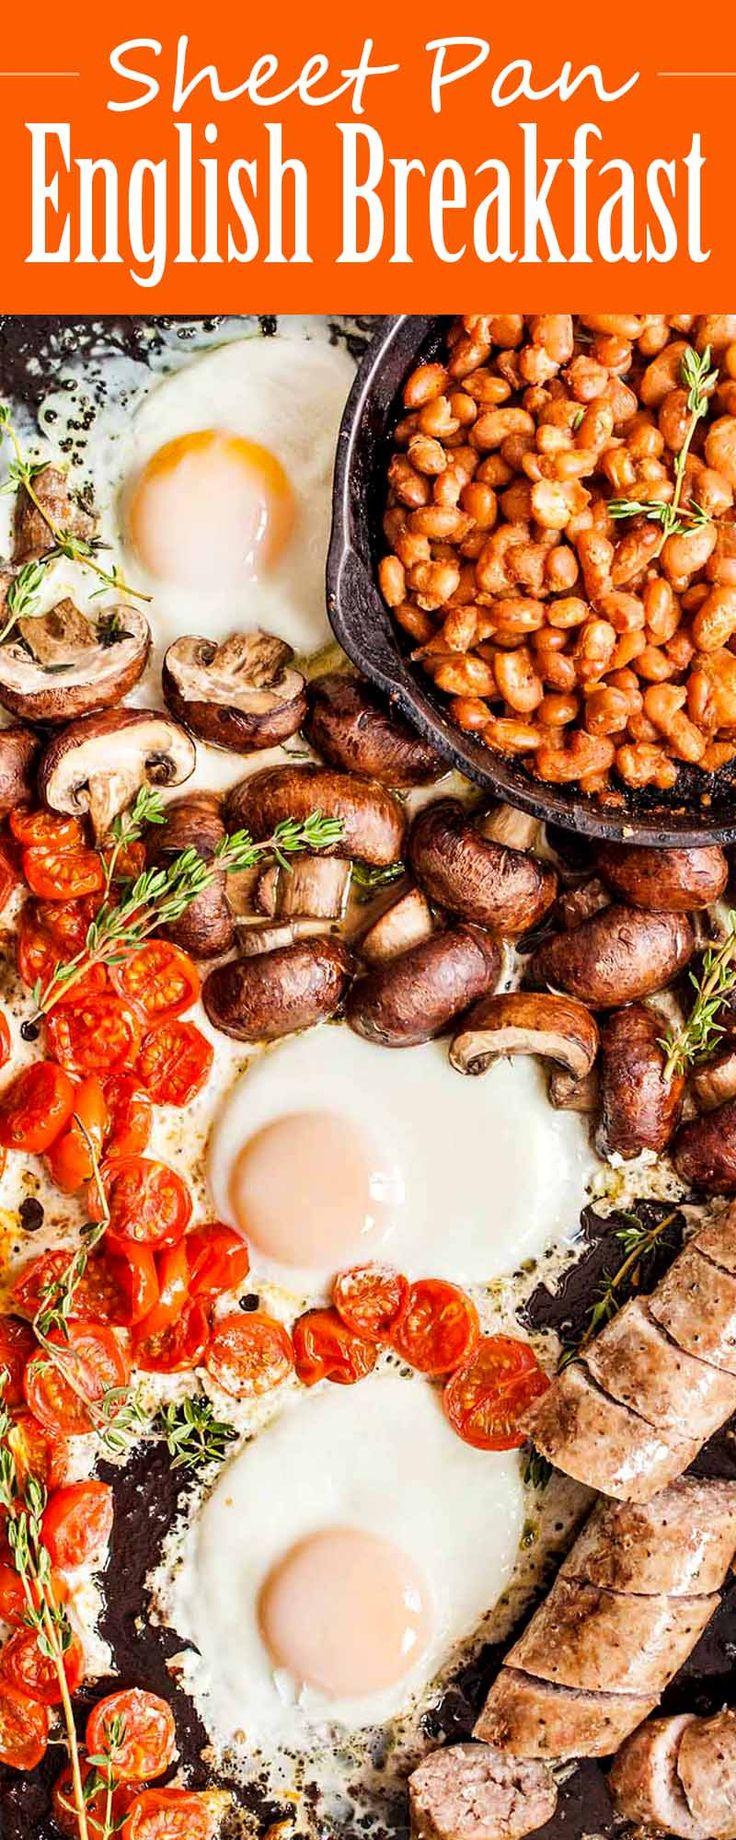 Sheet Pan English Breakfast Recipe | SimplyRecipes.com